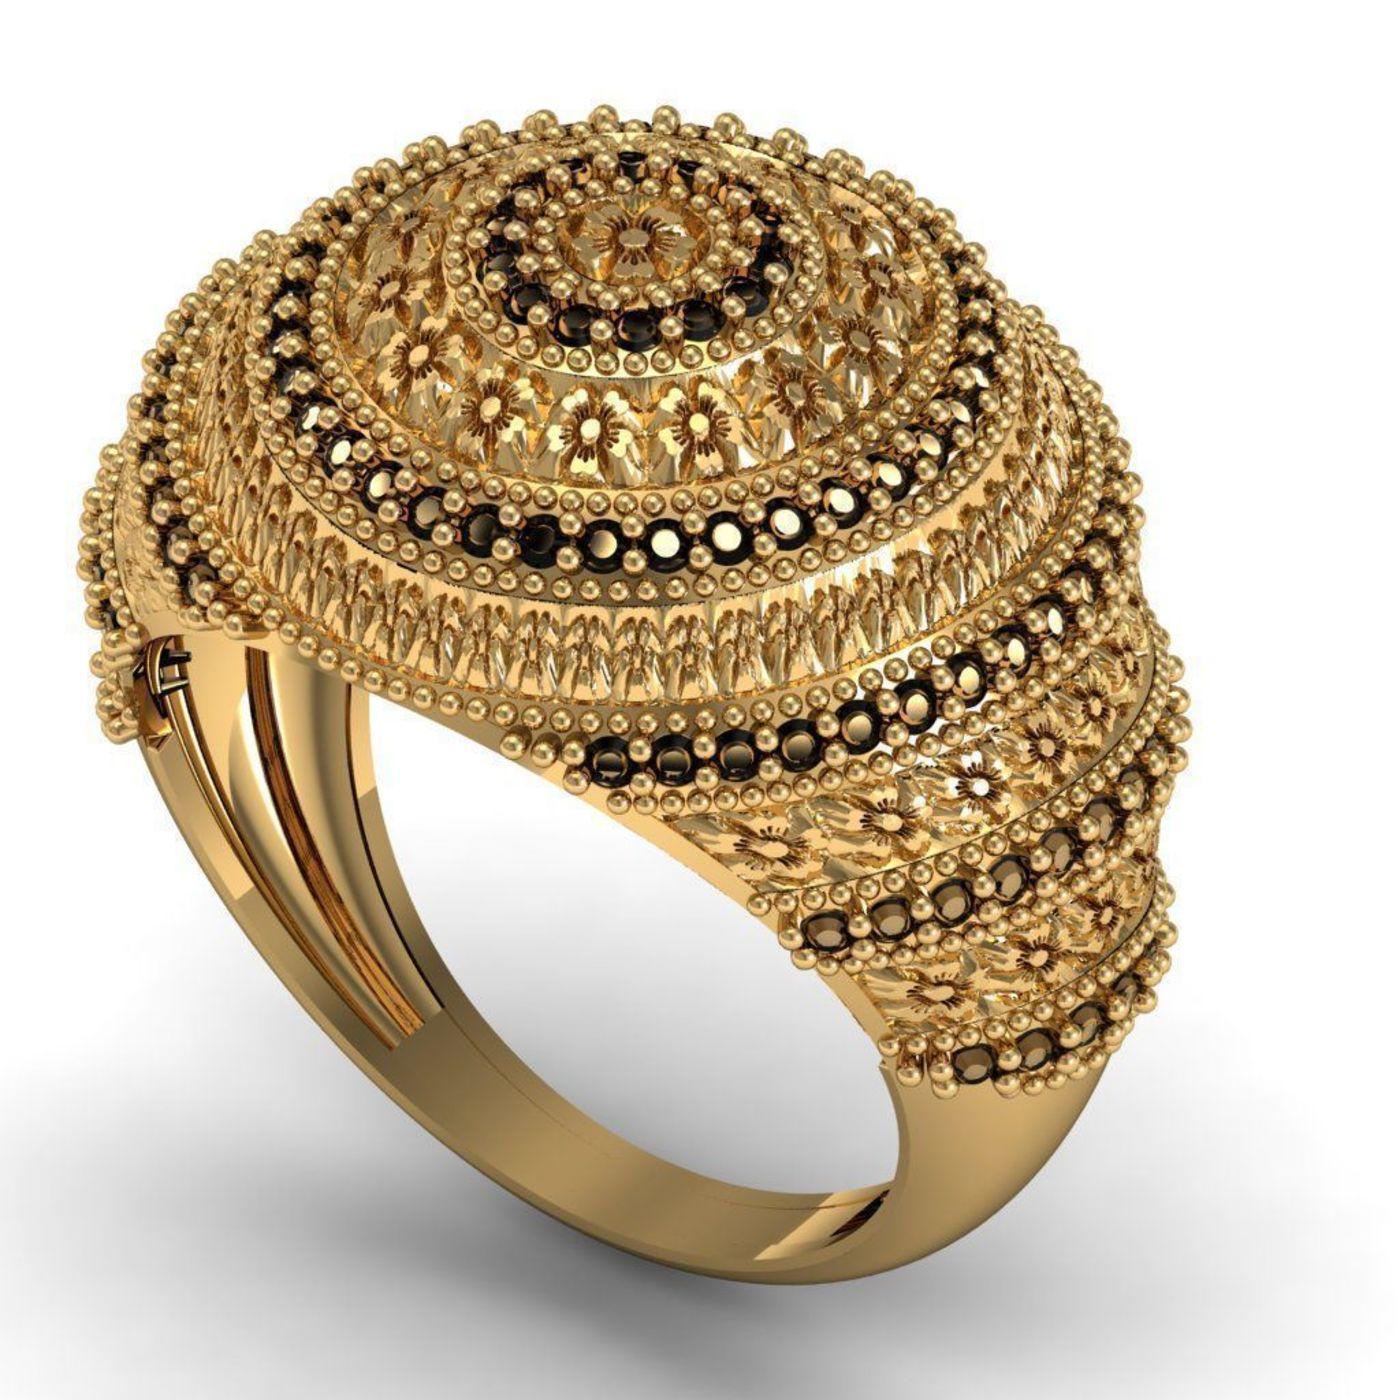 ring& medal@brooche